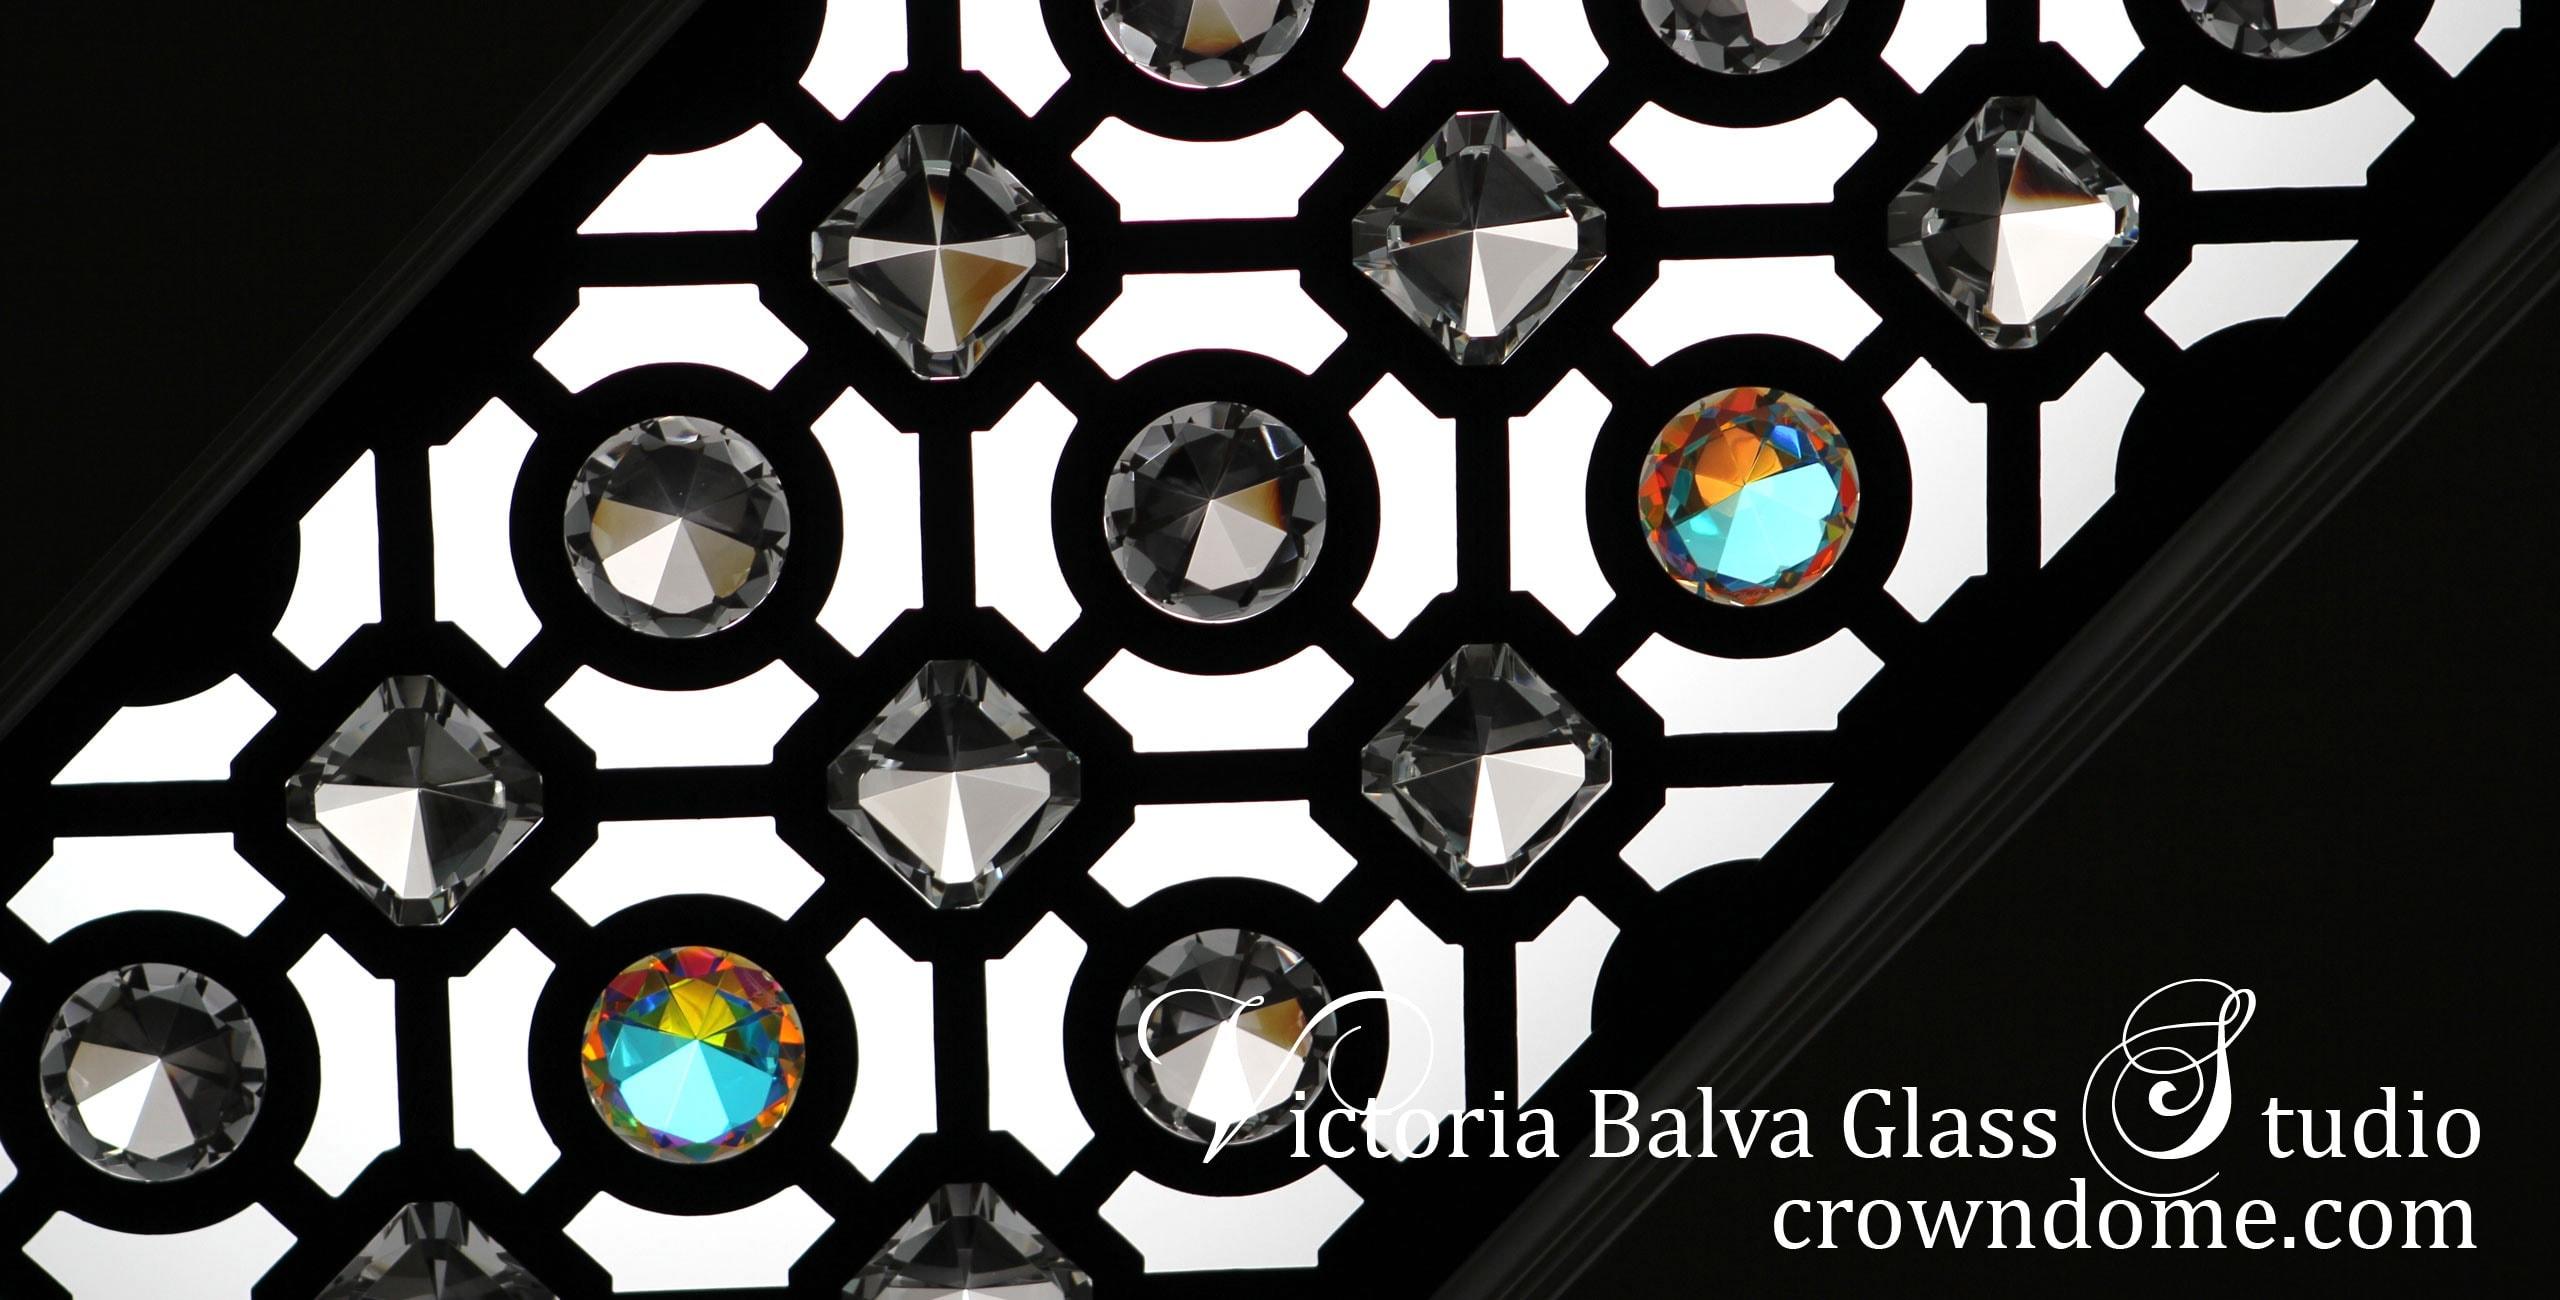 decorative windows for bathrooms.htm small decorative glass skylight for bathroom germana victoria balva  small decorative glass skylight for